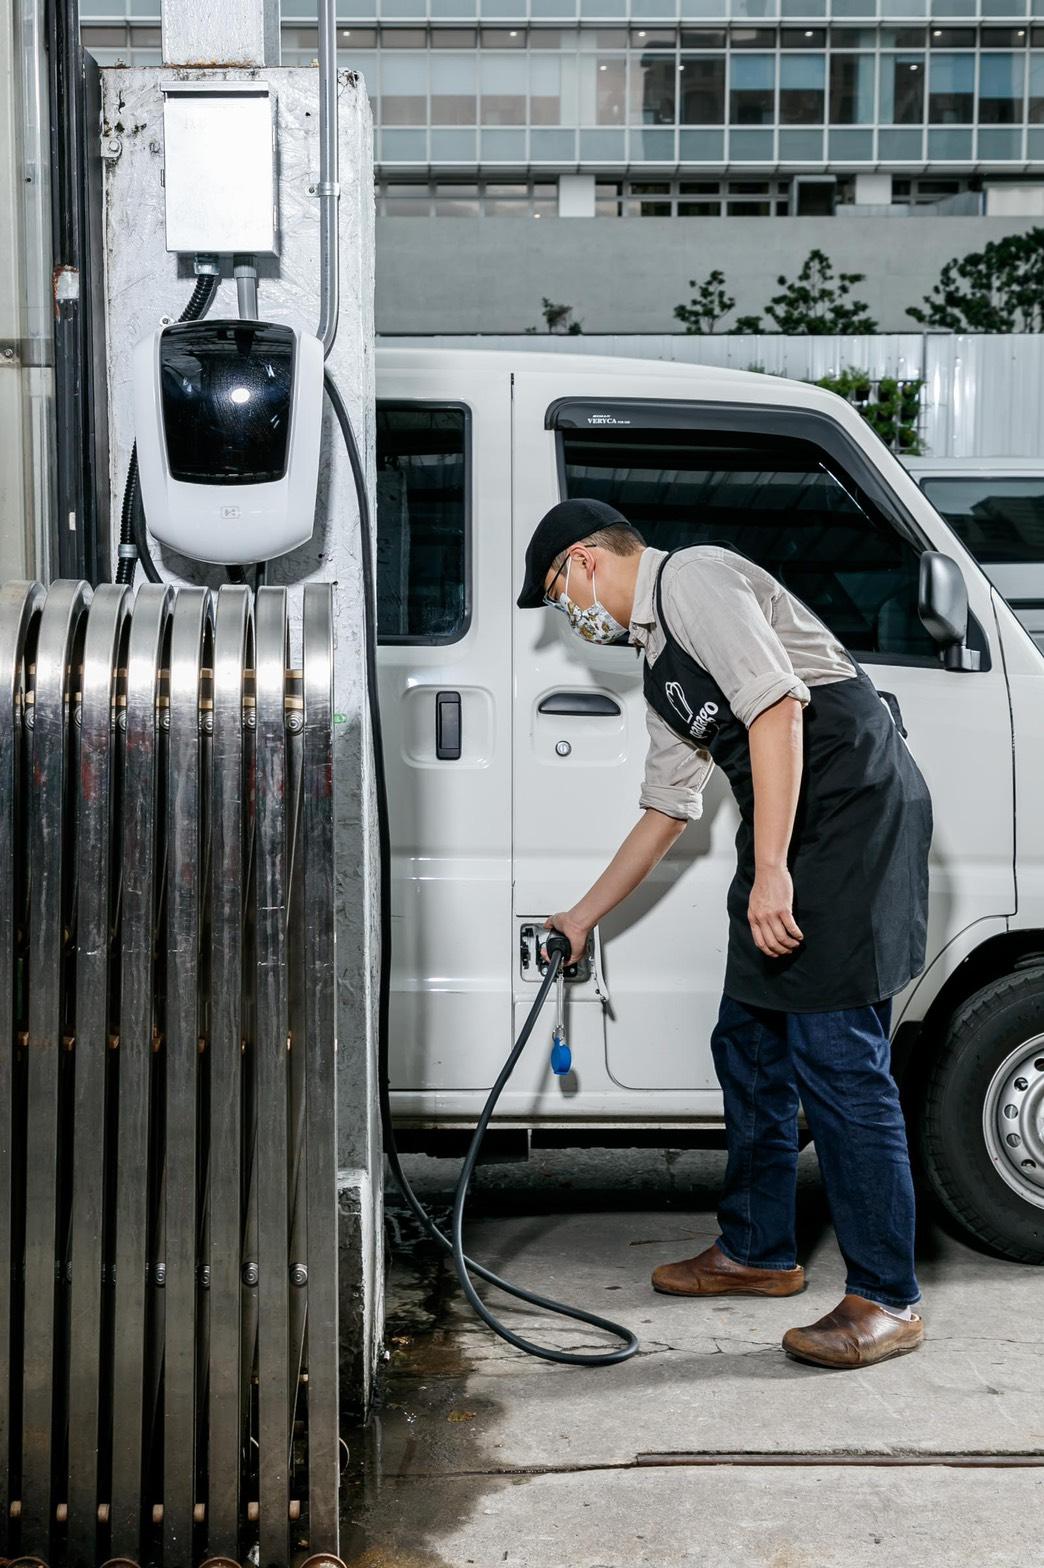 e-Veryca 菱利電動車透過壁掛充電器便利充電。